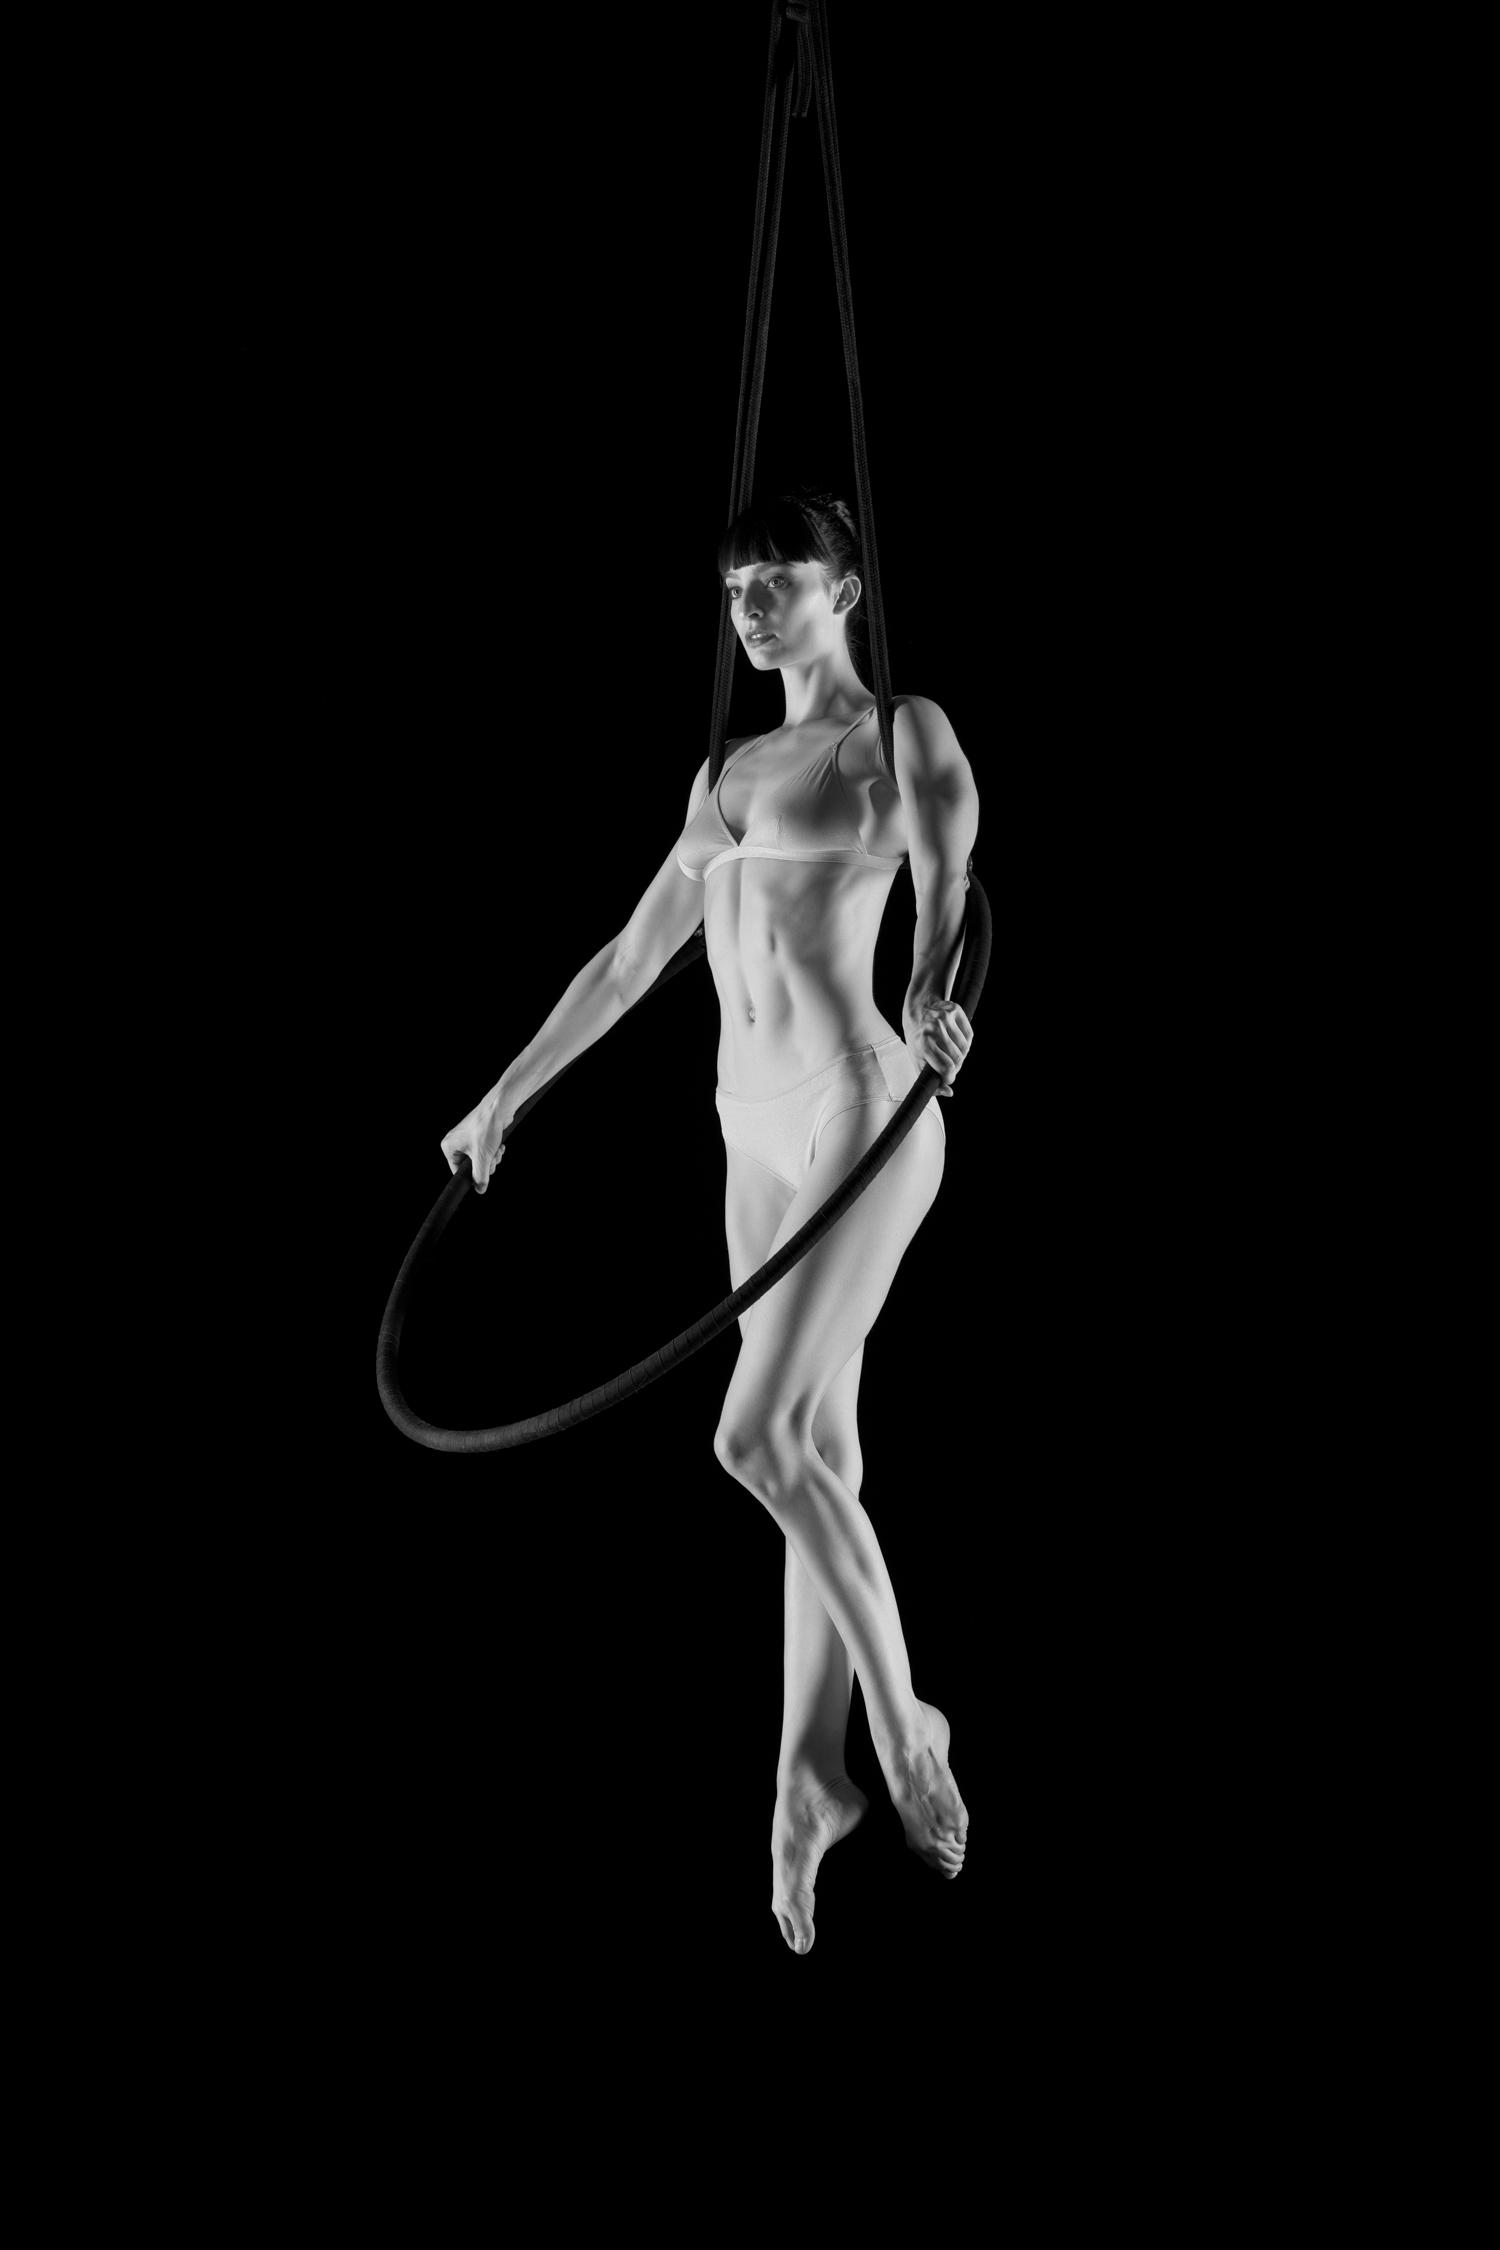 0171 Dance Shoot Air Elegance 2 B_W.jpg